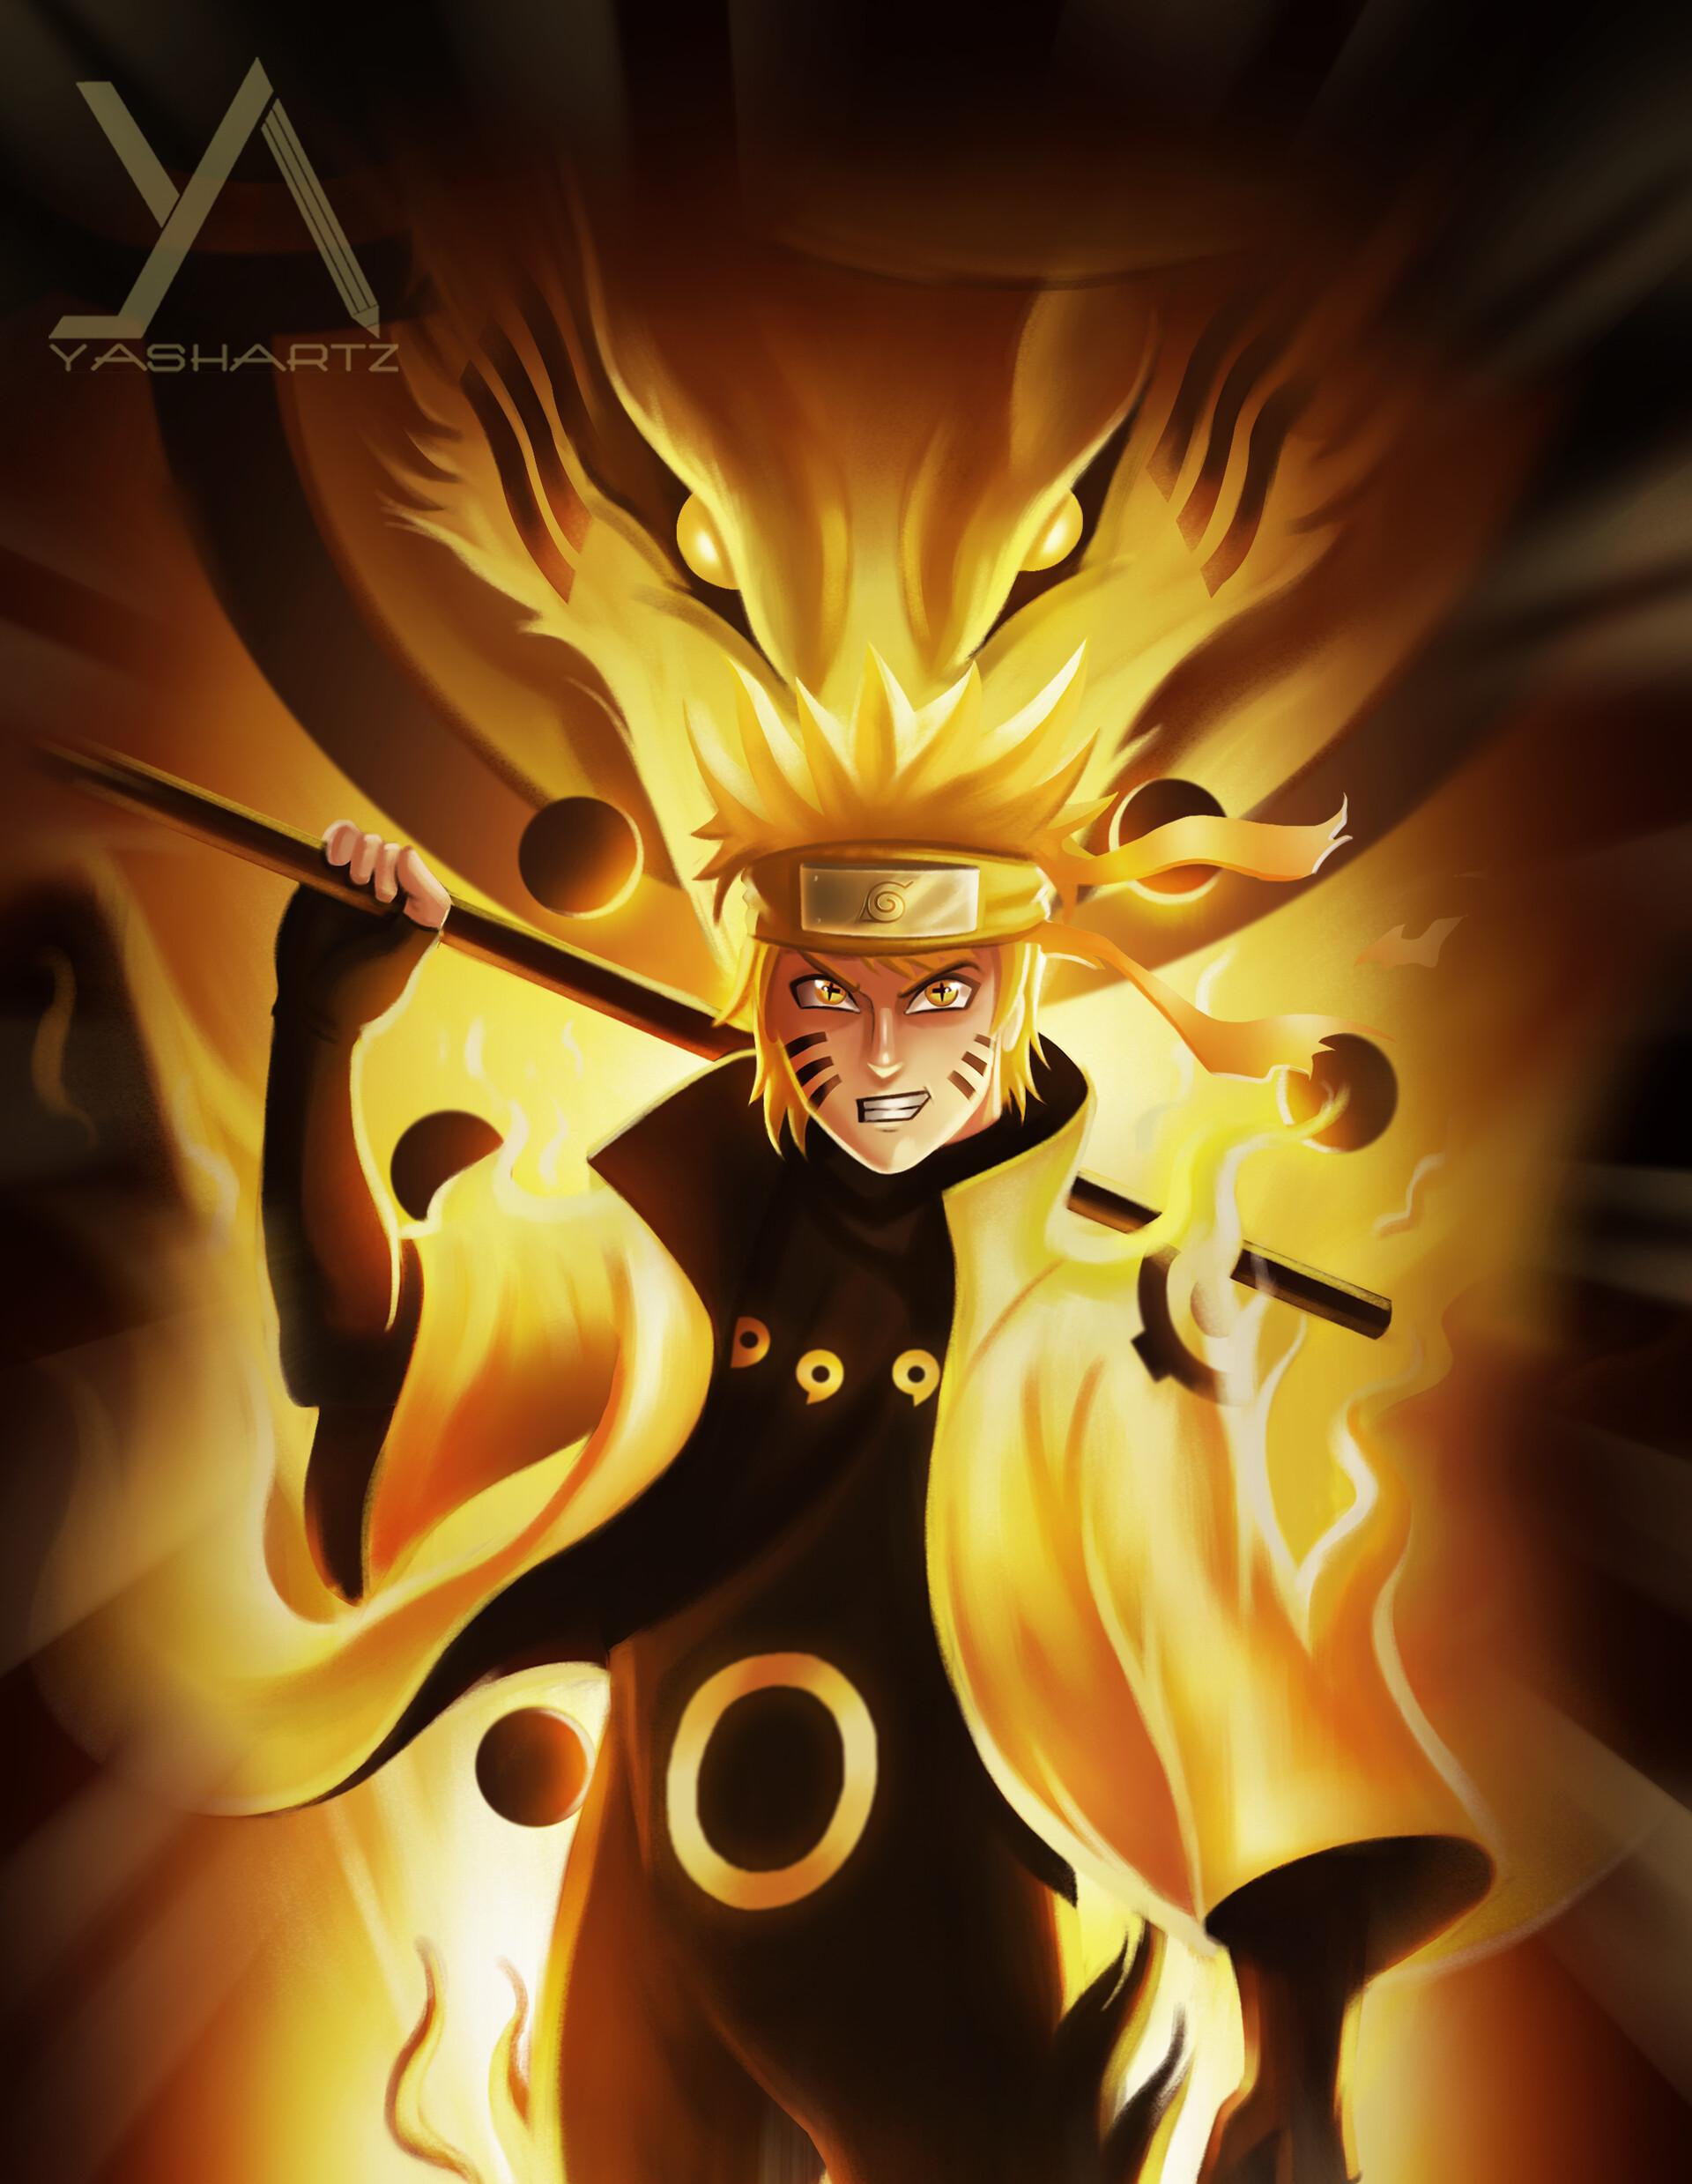 Anime Wallpaper Hd Naruto Modo Rikudou Wallpaper